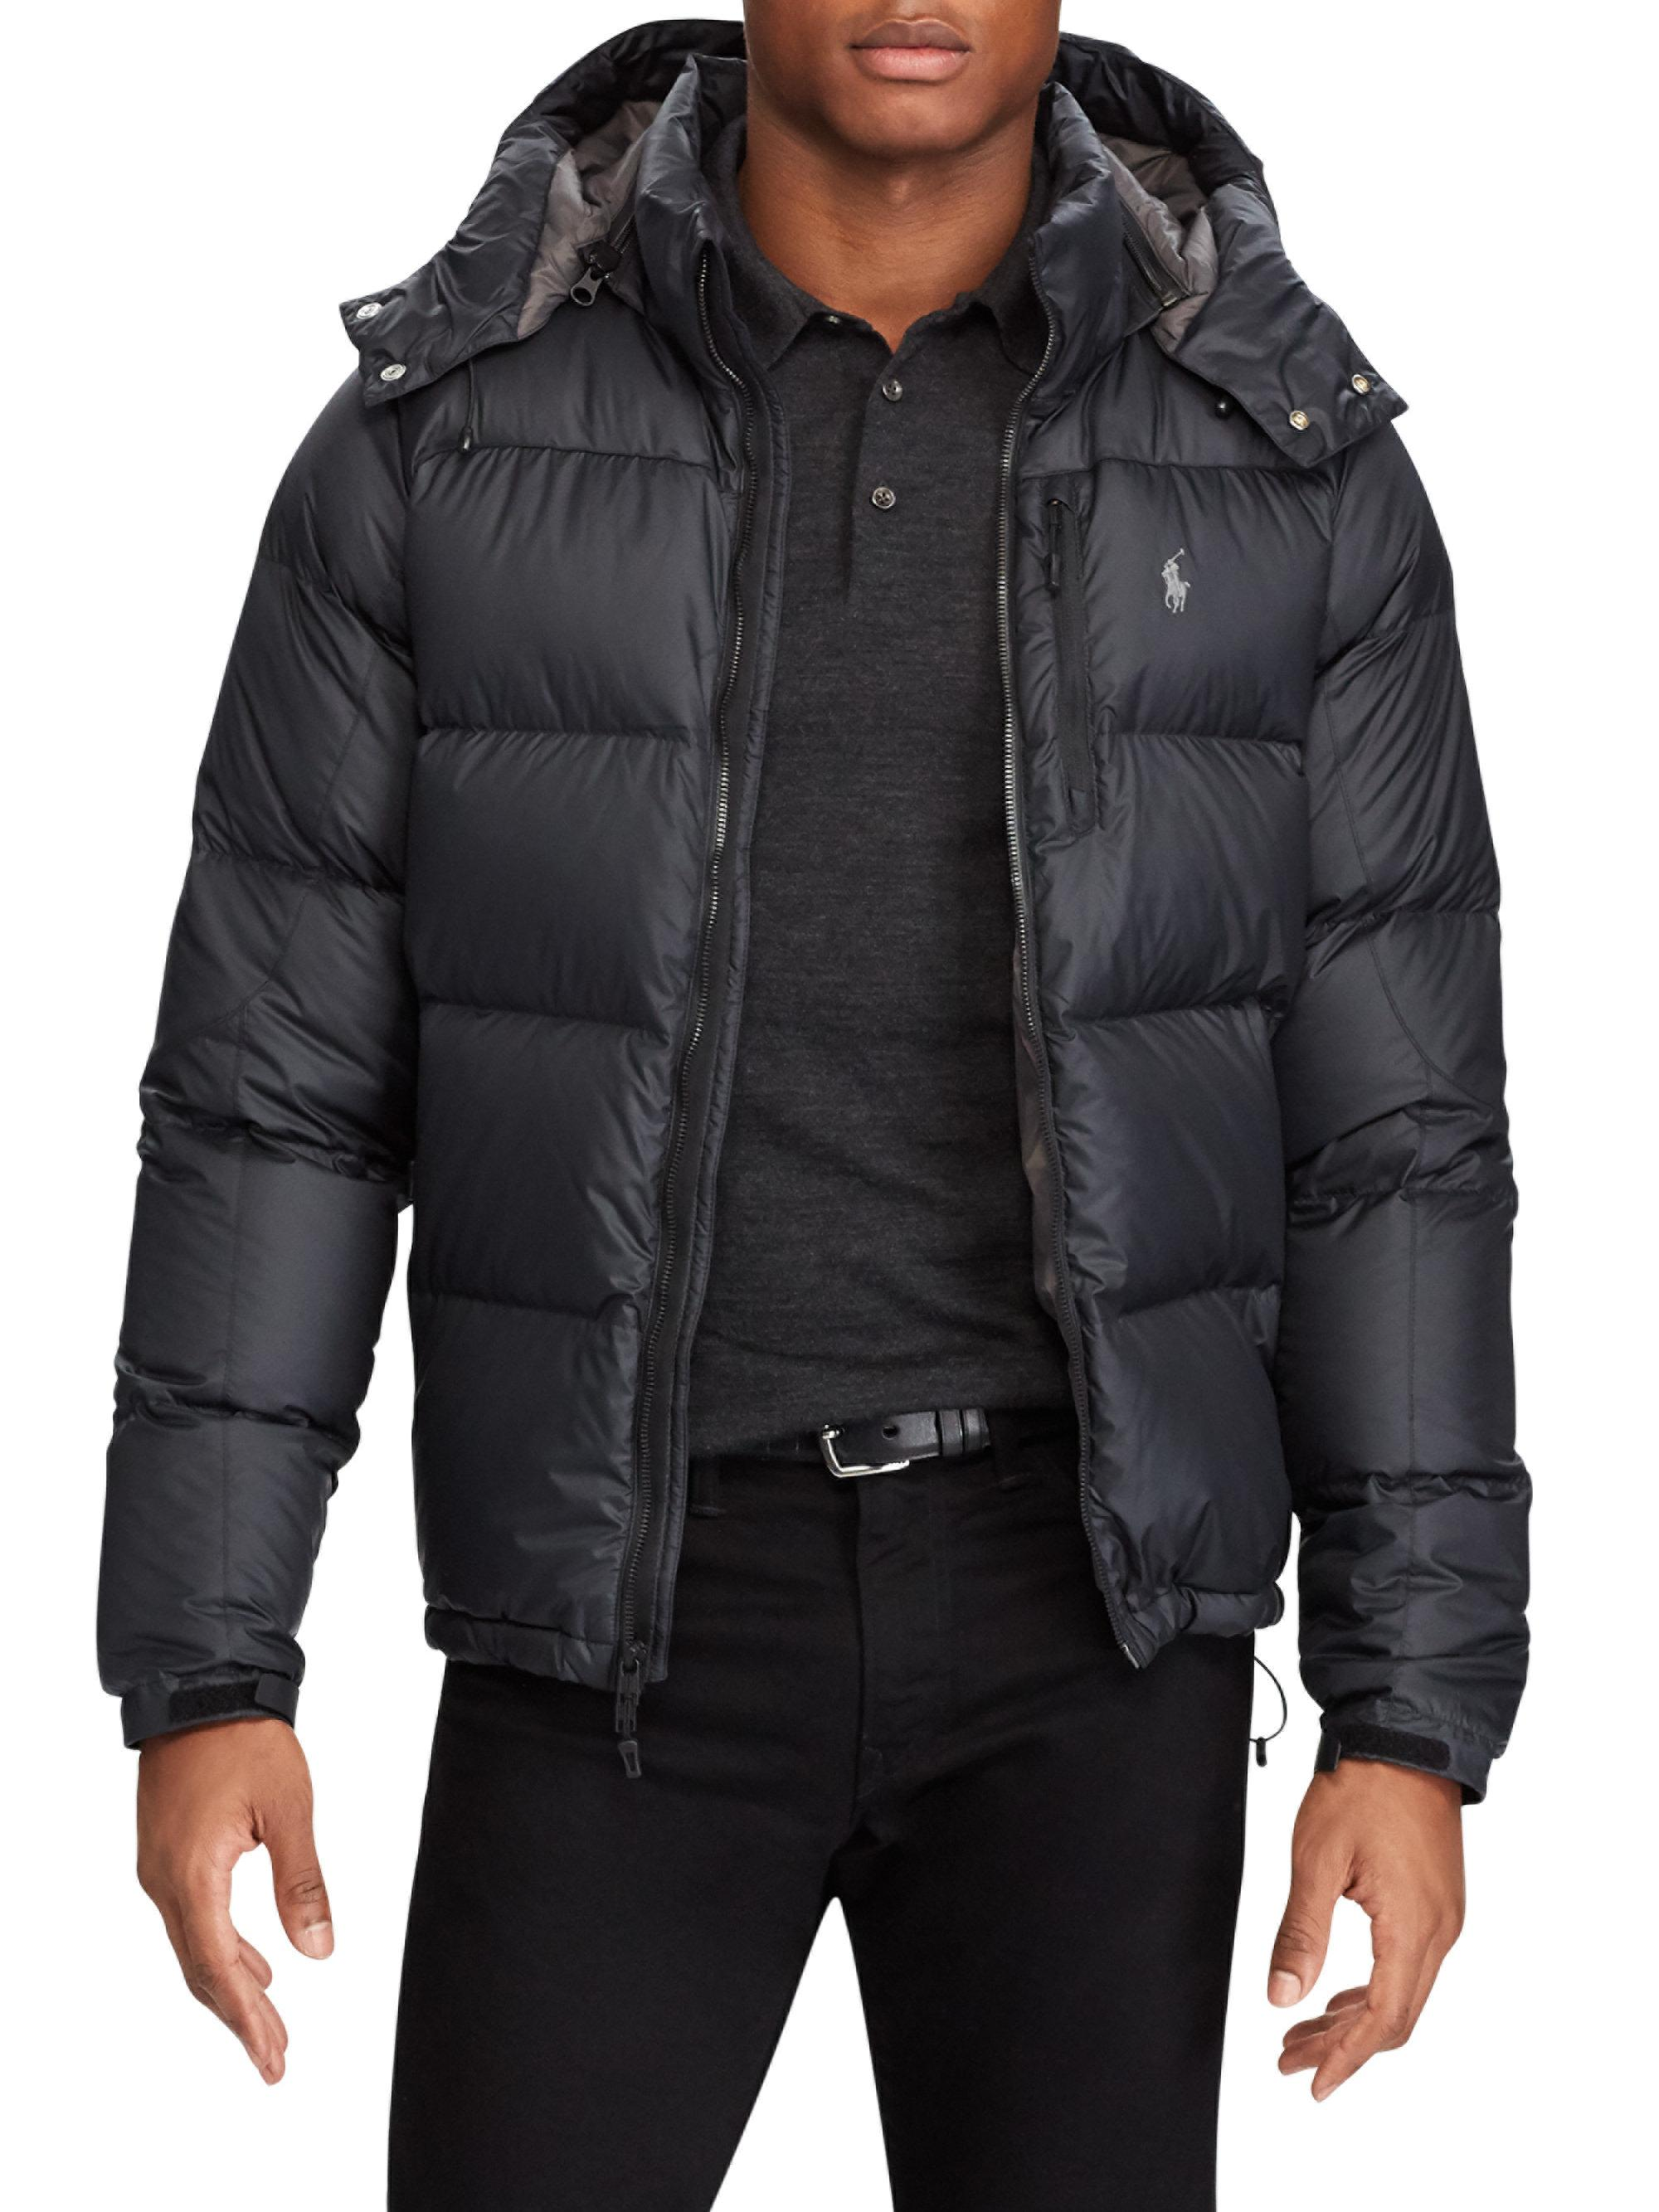 Polo Ralph Lauren Ripstop Water-repellent Down Jacket in Black for ... 0cf7795b0e1d